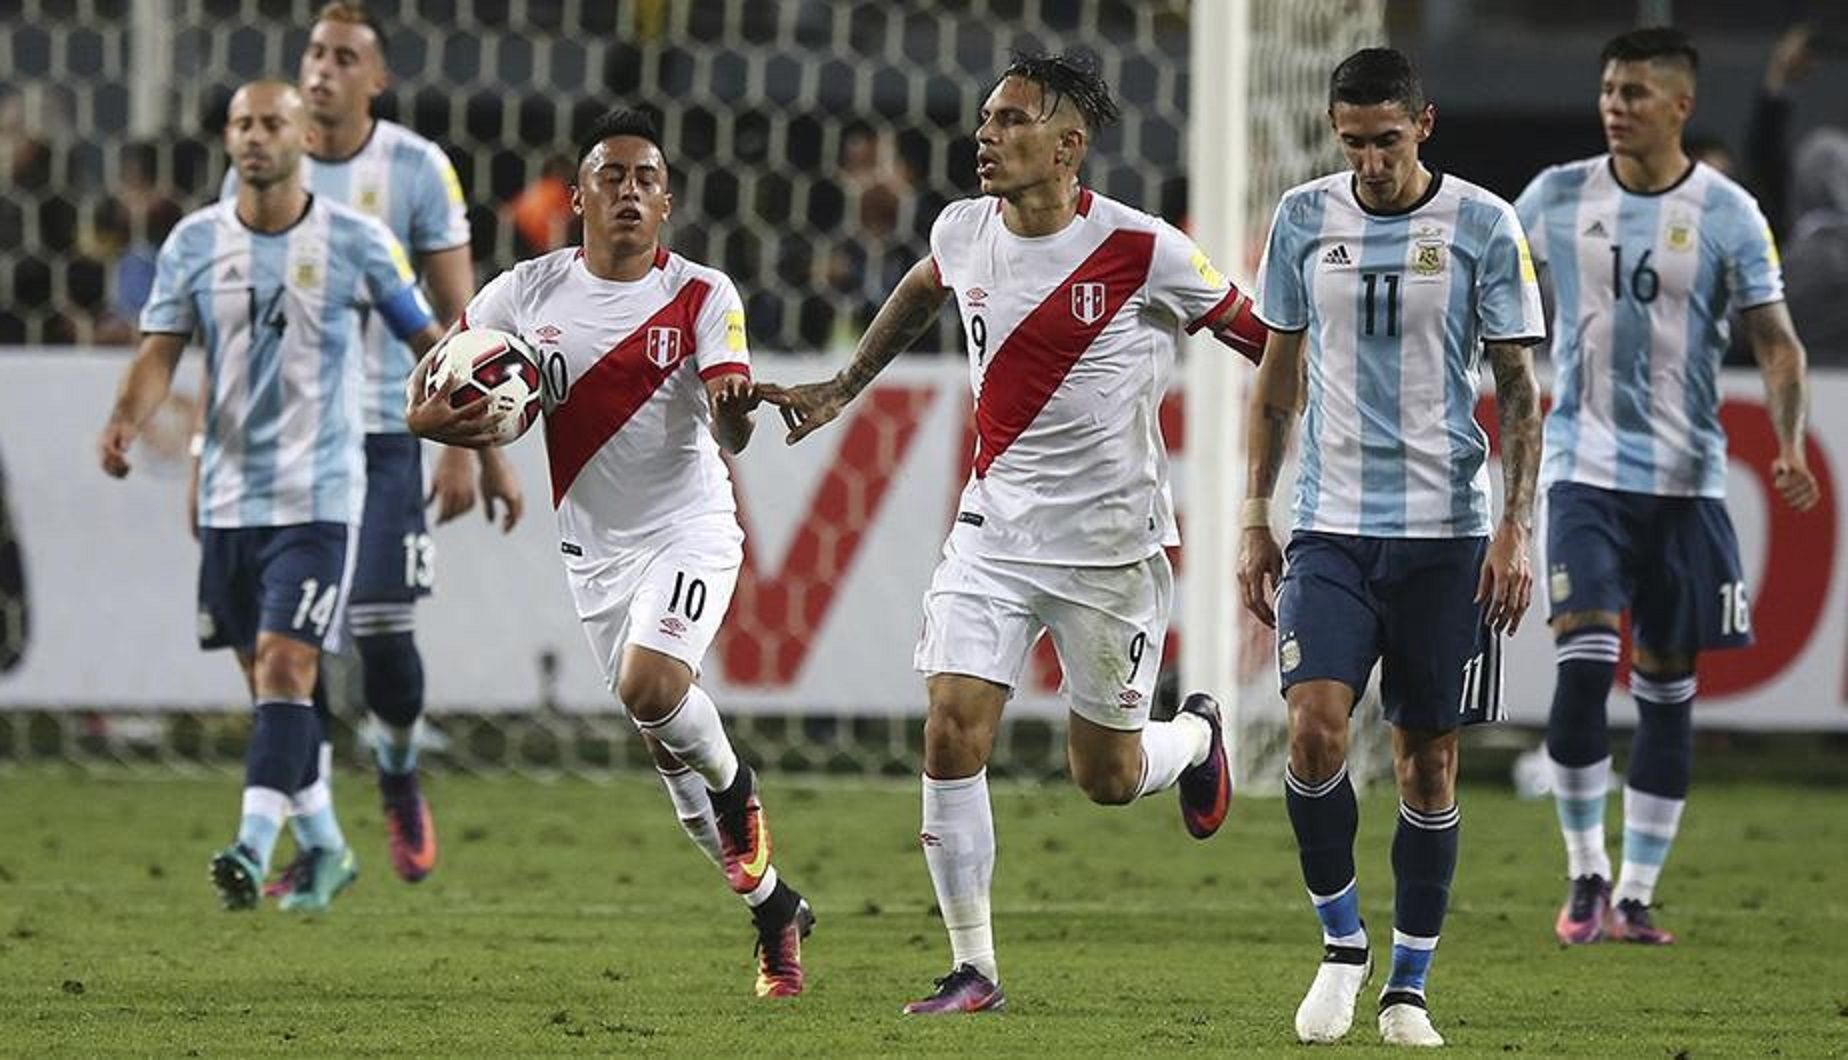 Seguí participando, Alemania: ¿por qué Perú llega como campeón mundial a Rusia 2018?